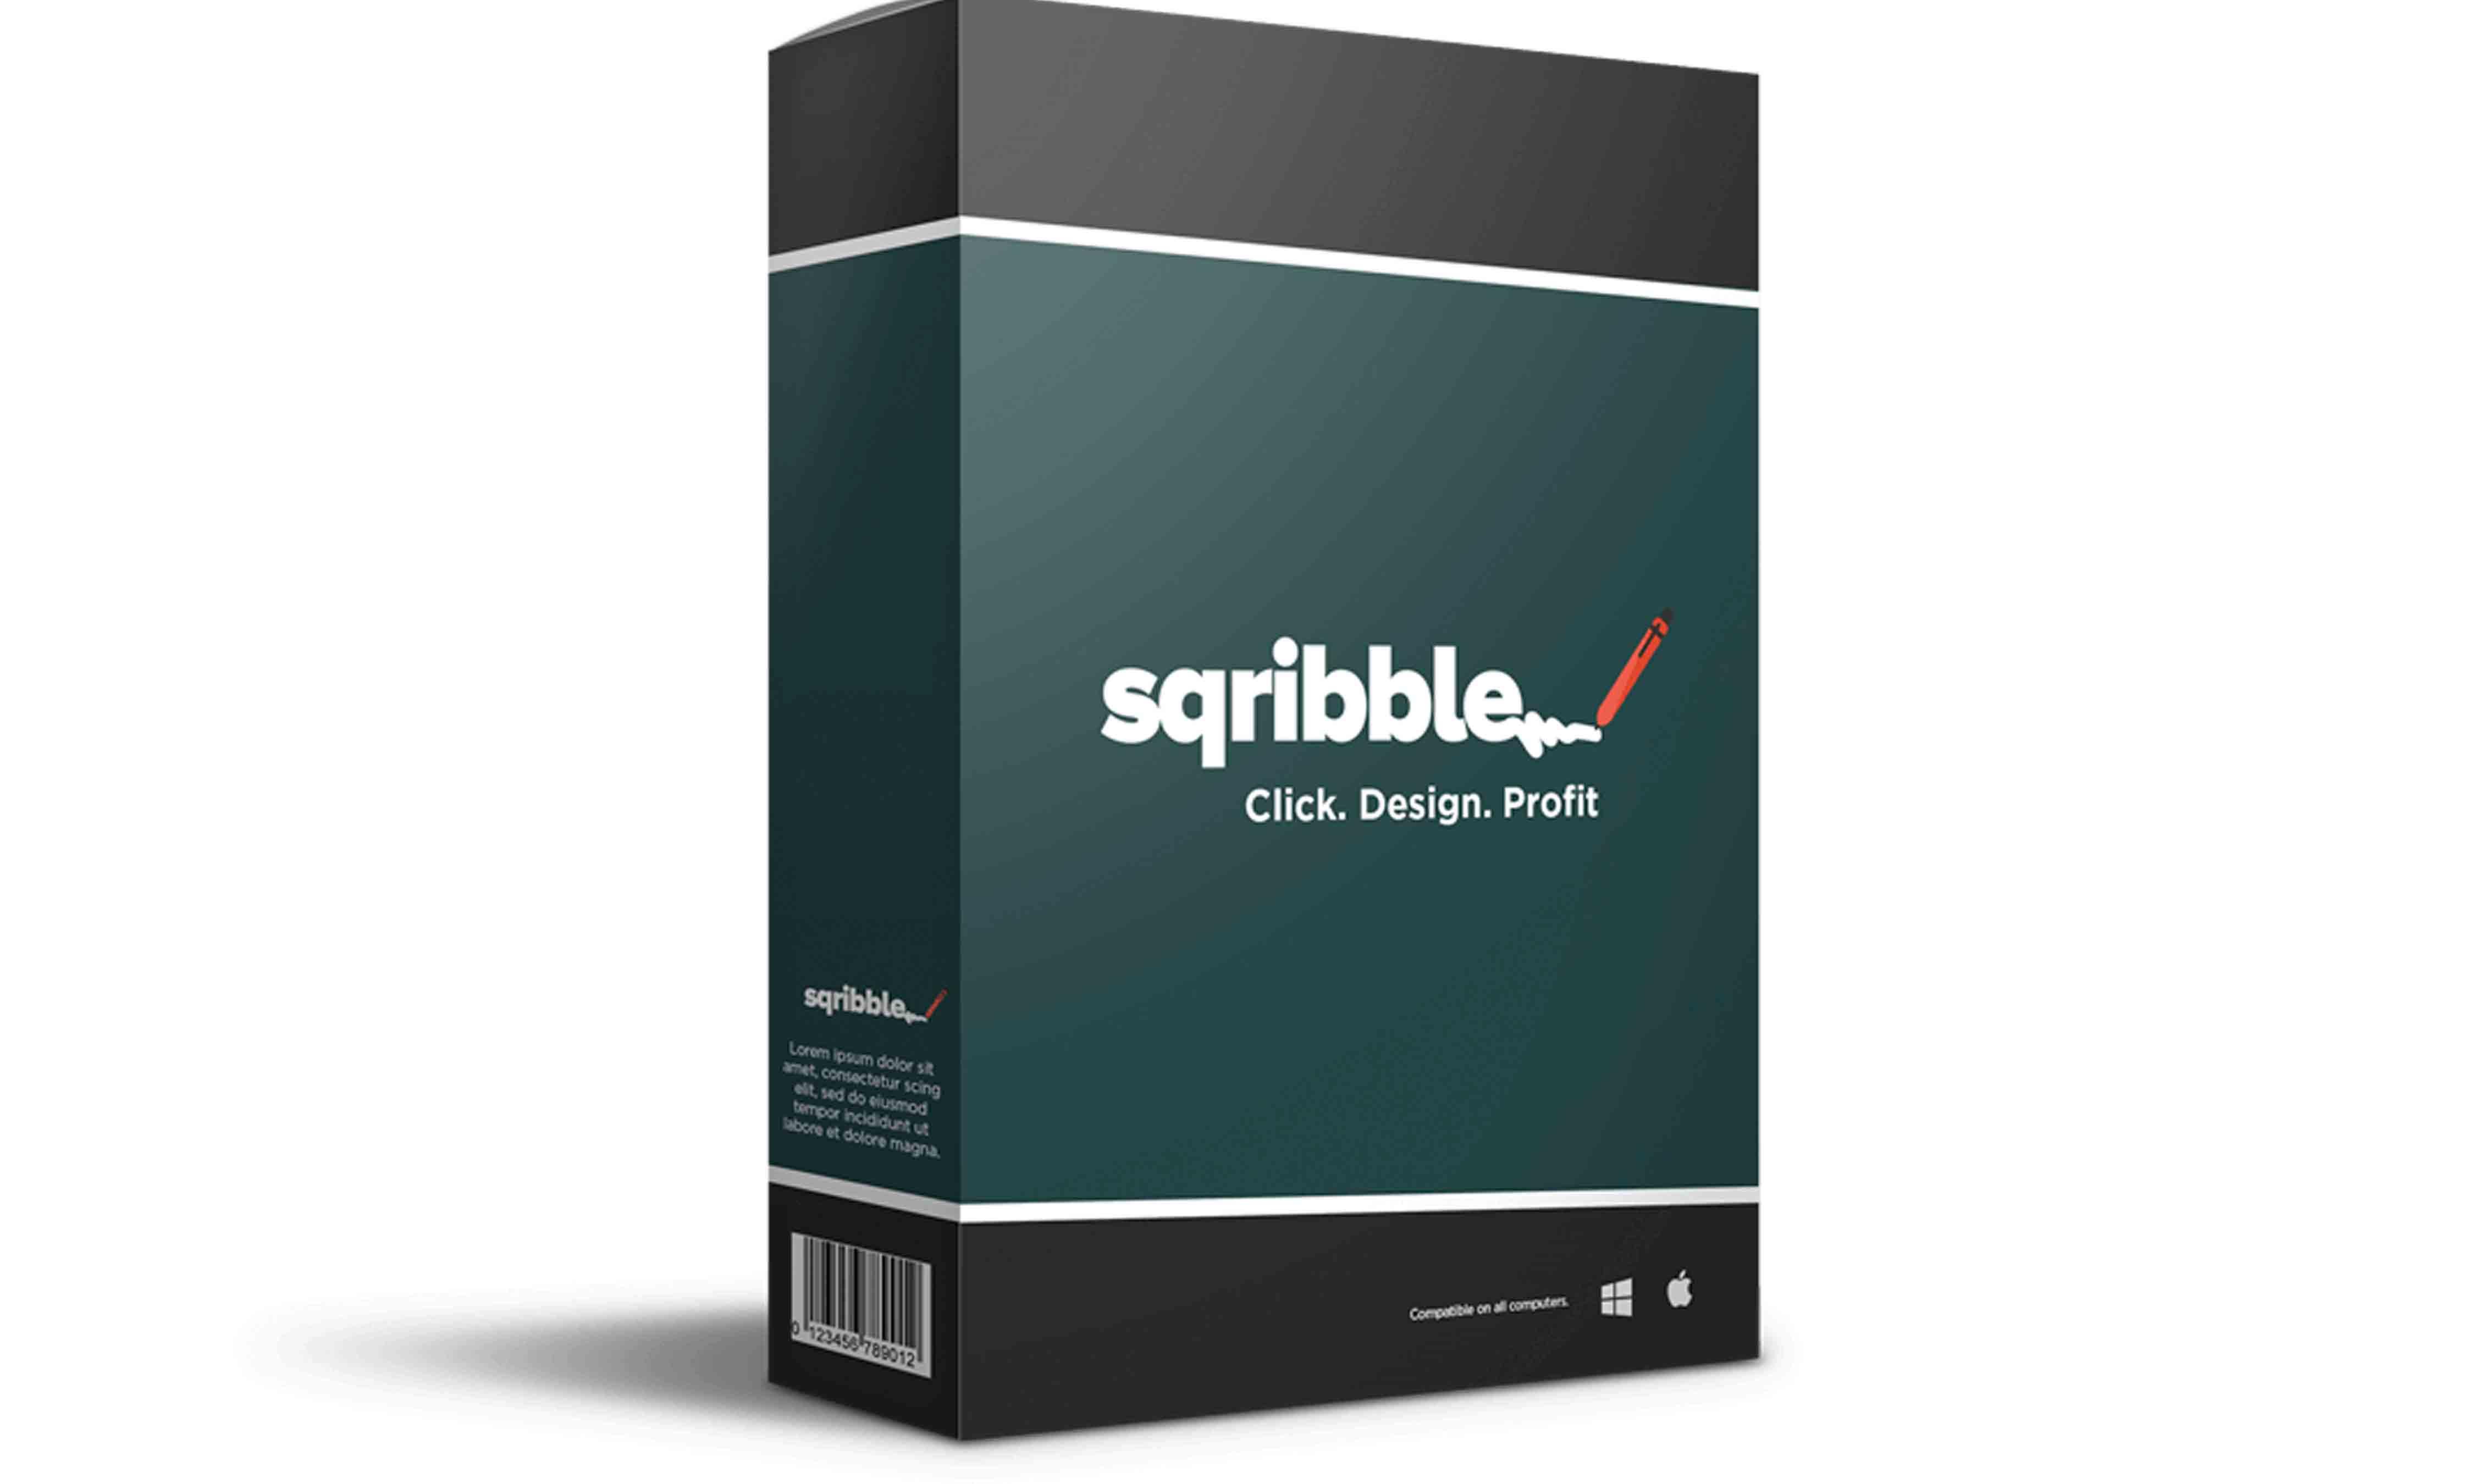 Sqribble